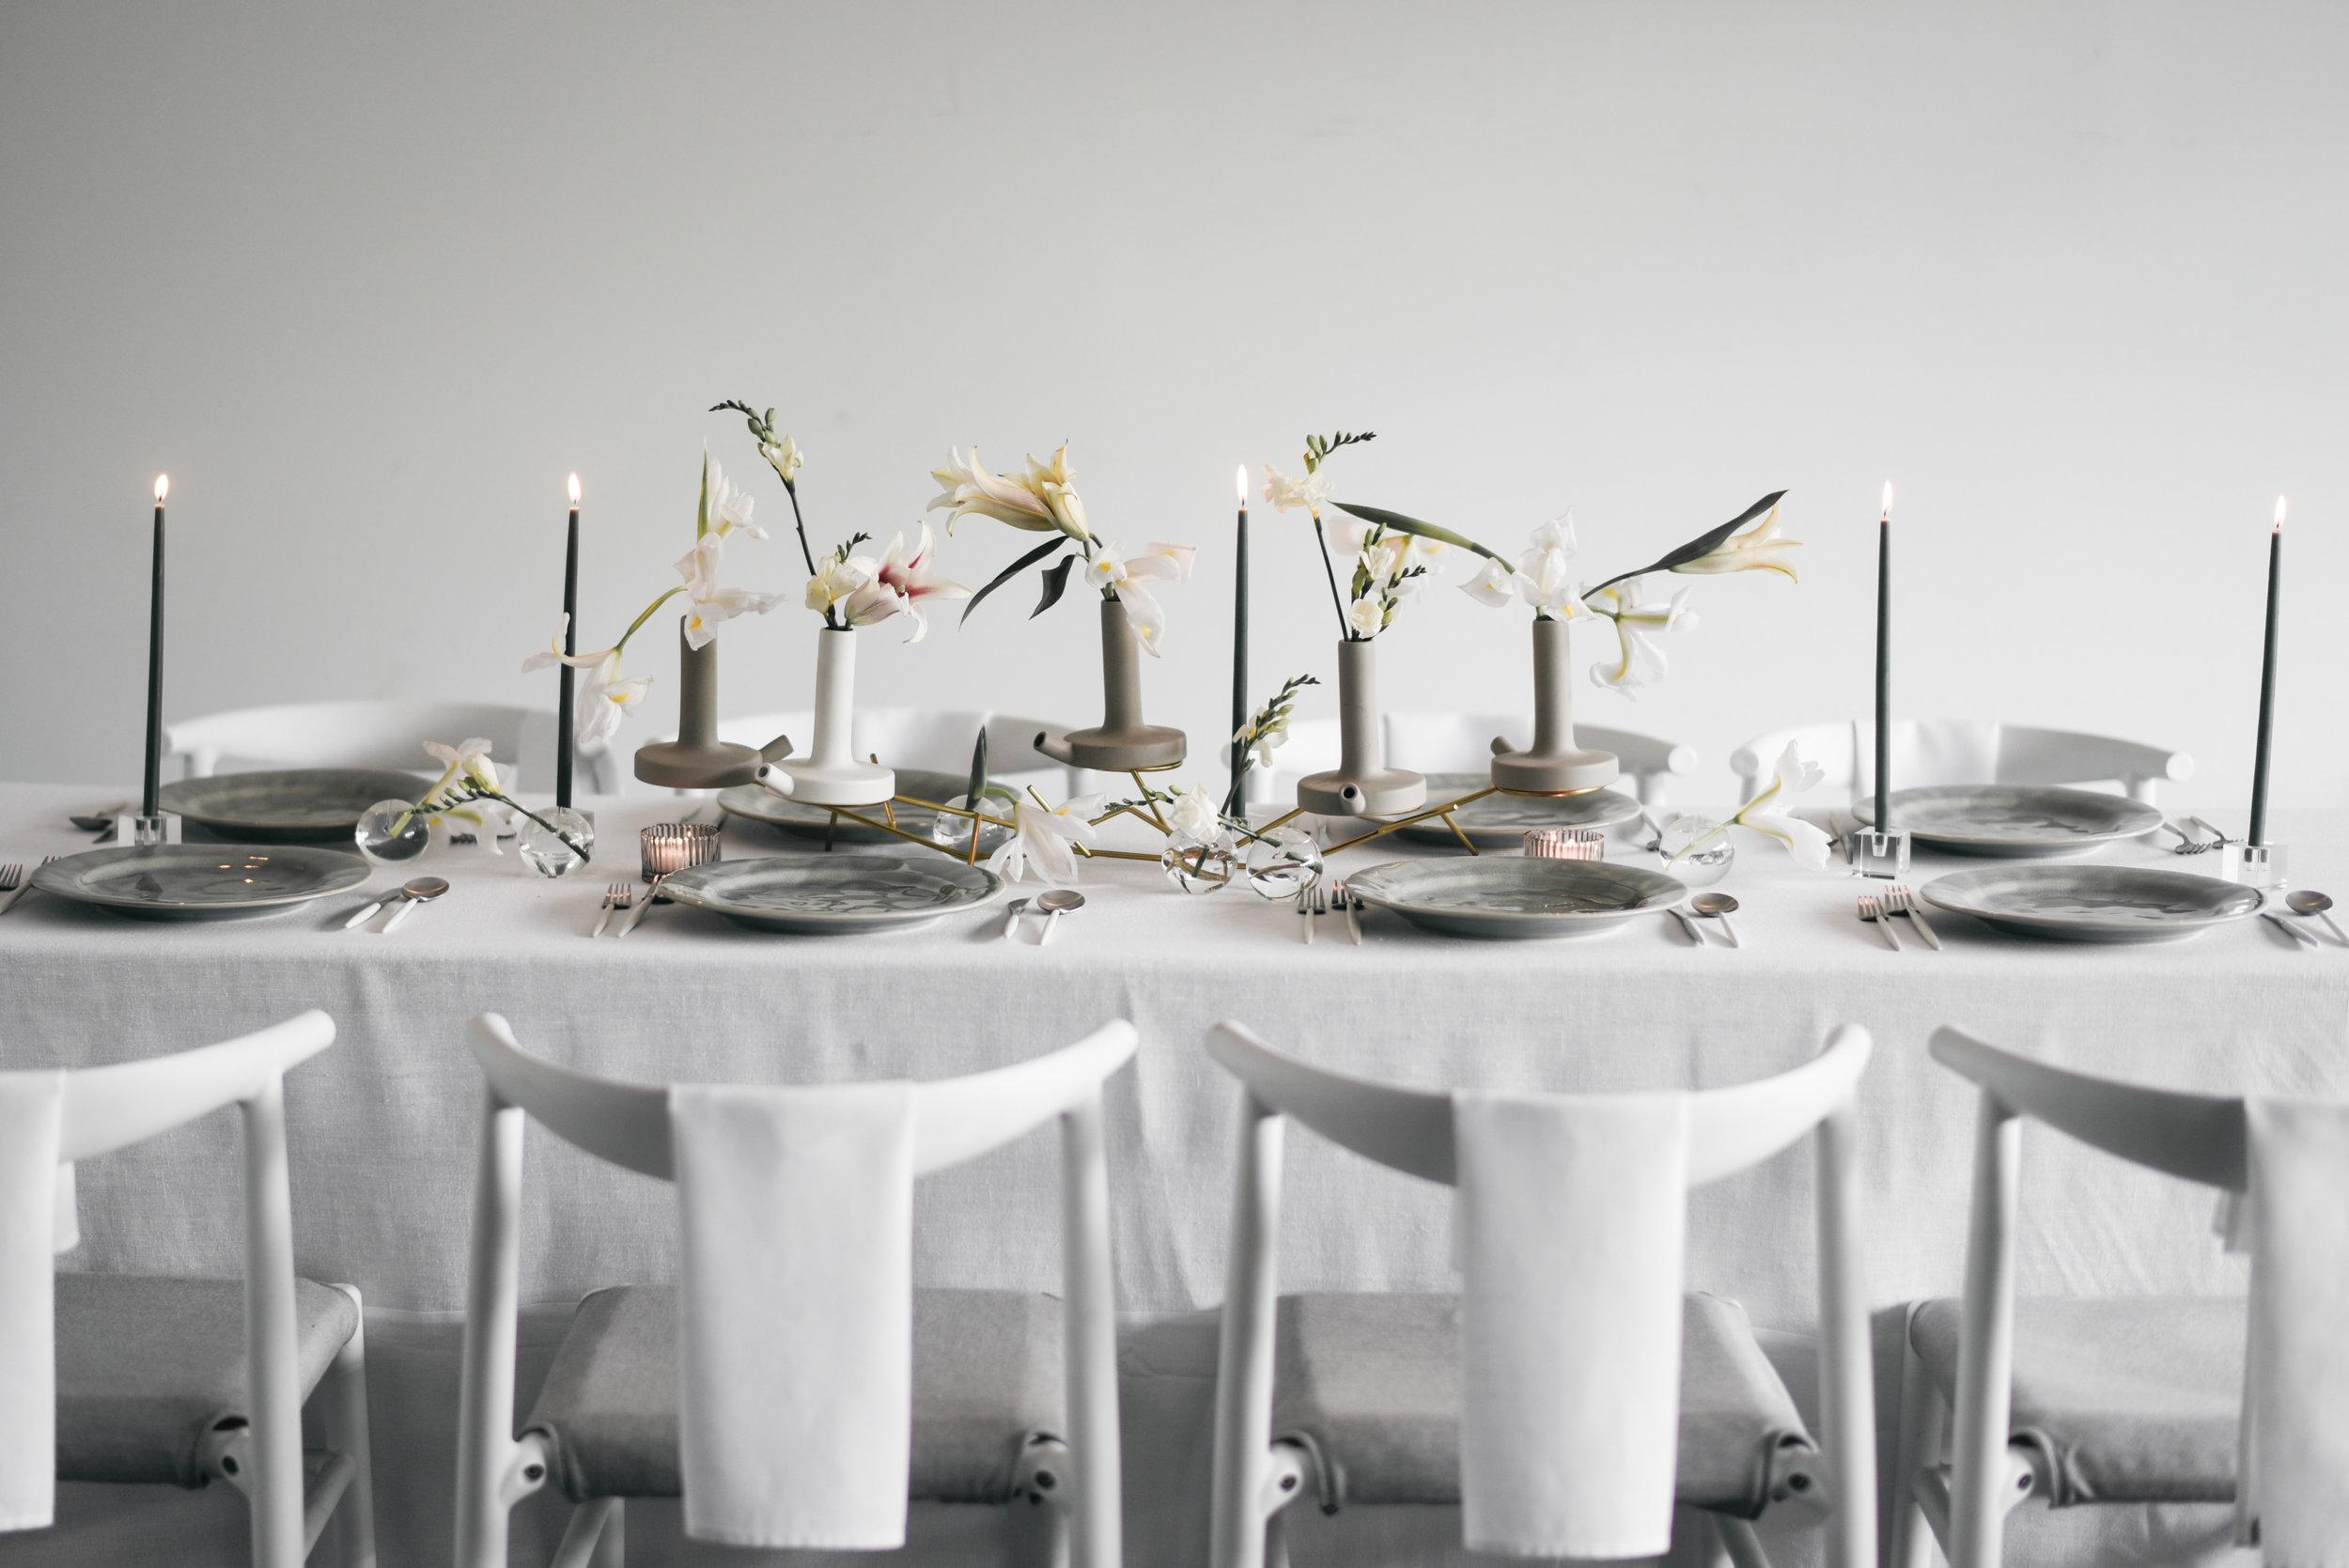 12th-Table-WEDDING-RENTALS-NASHVILLE-Design-Tips-Hosting-ENTERTAINING-City-Tablescapes-(2)-44.jpg